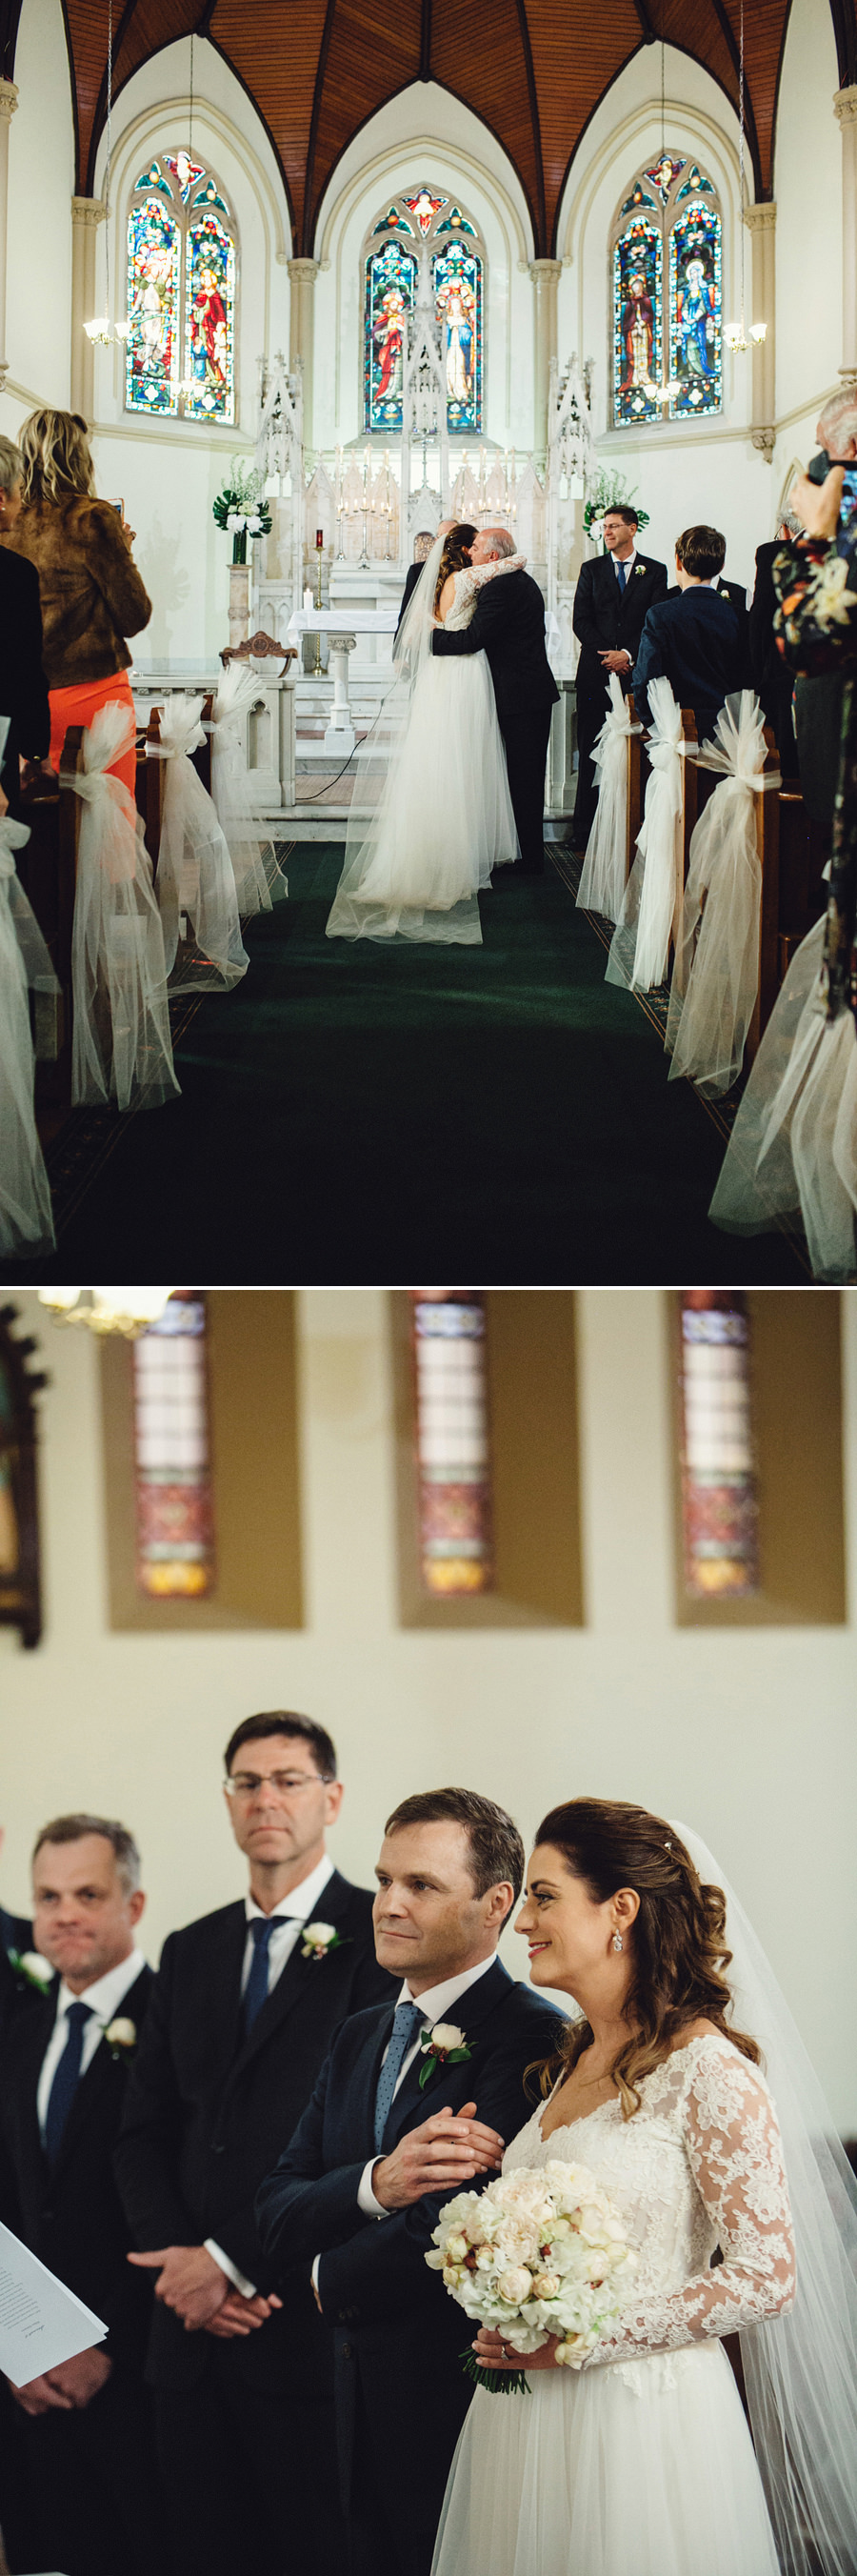 St Vincent's Potts Point Wedding Photographer: Ceremony